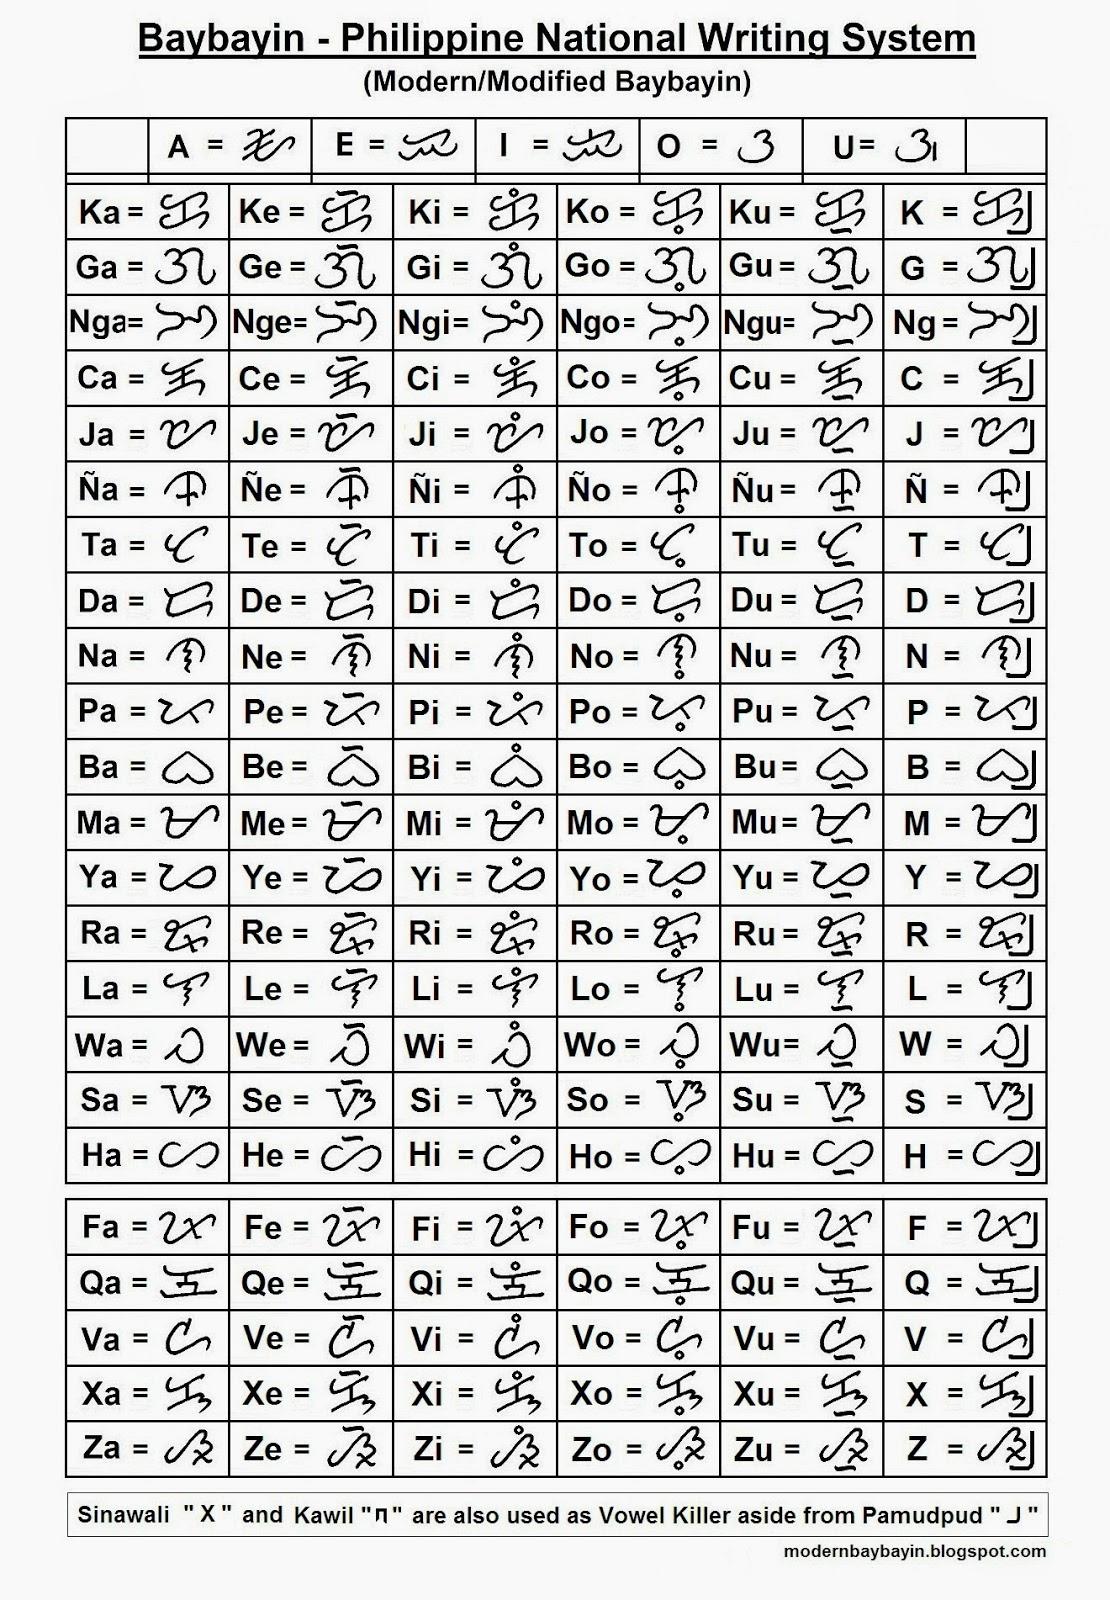 Development and Standardization of Baybayin script: Modern ...